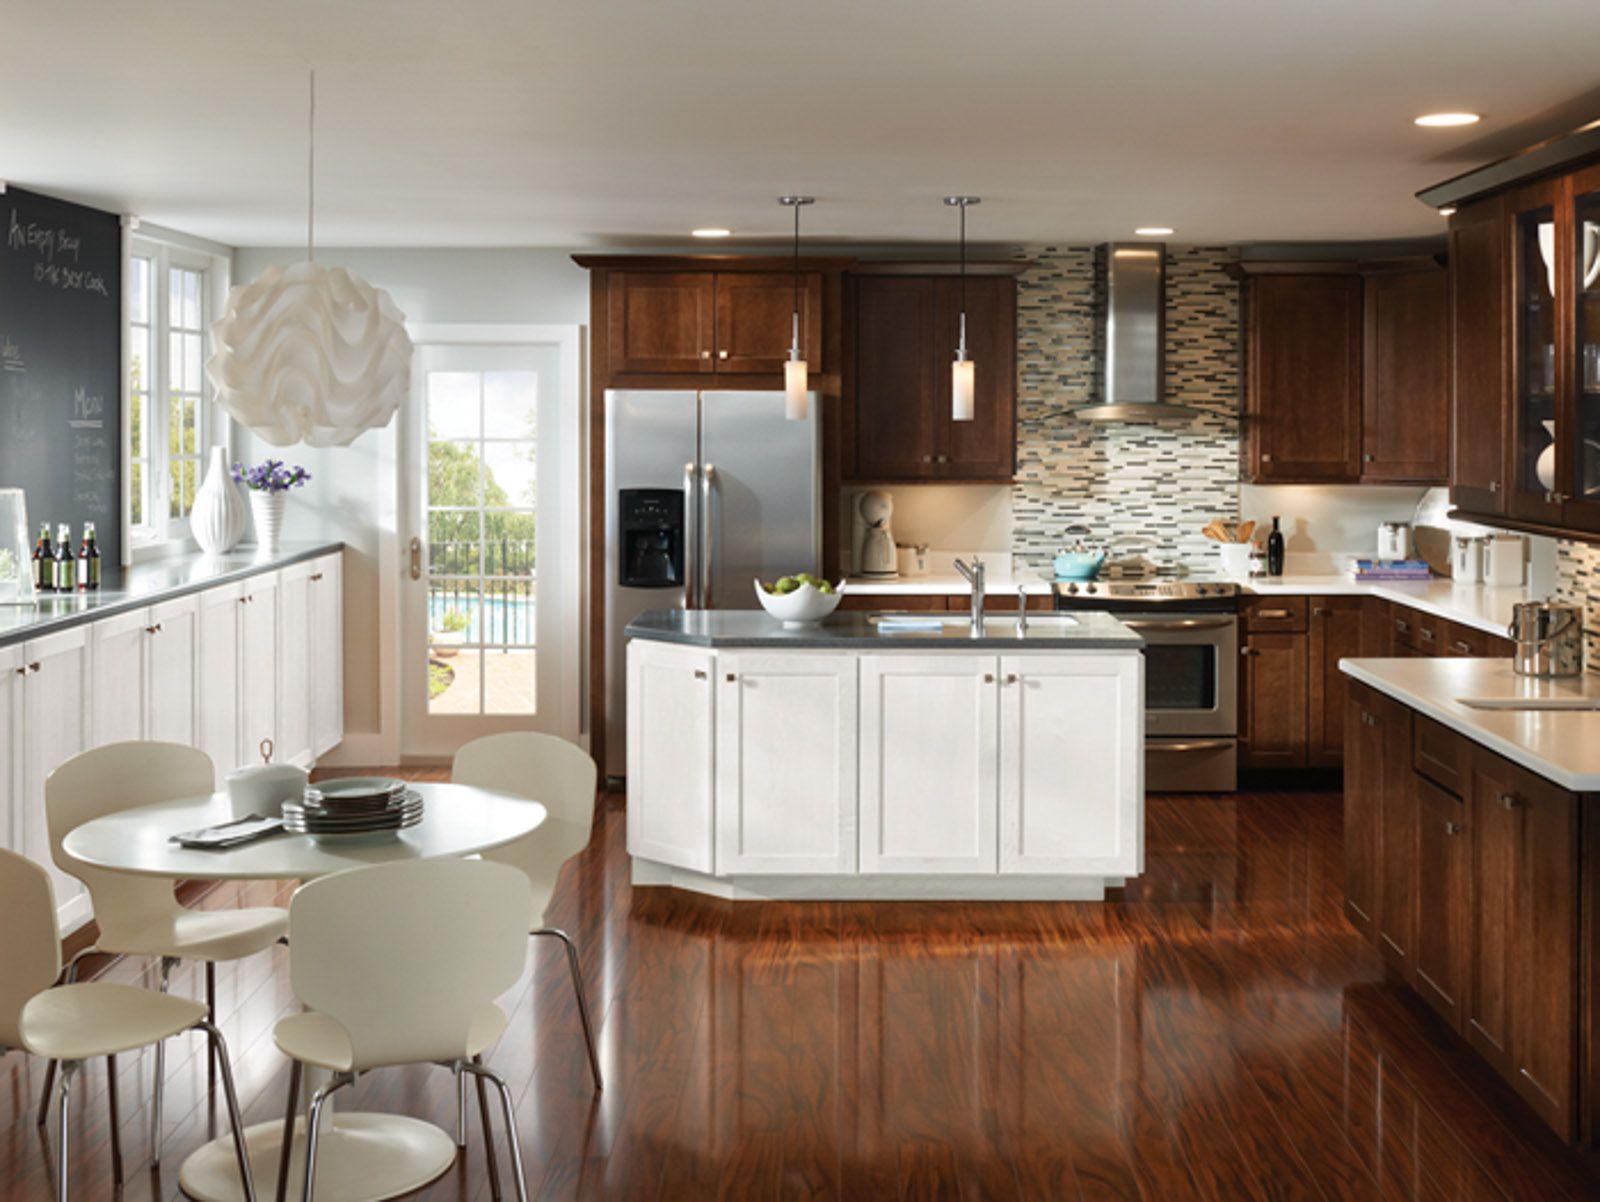 Lausanne Cabinets Kitchen Slab Quality Kitchen Cabinets Maple Kitchen Cabinets